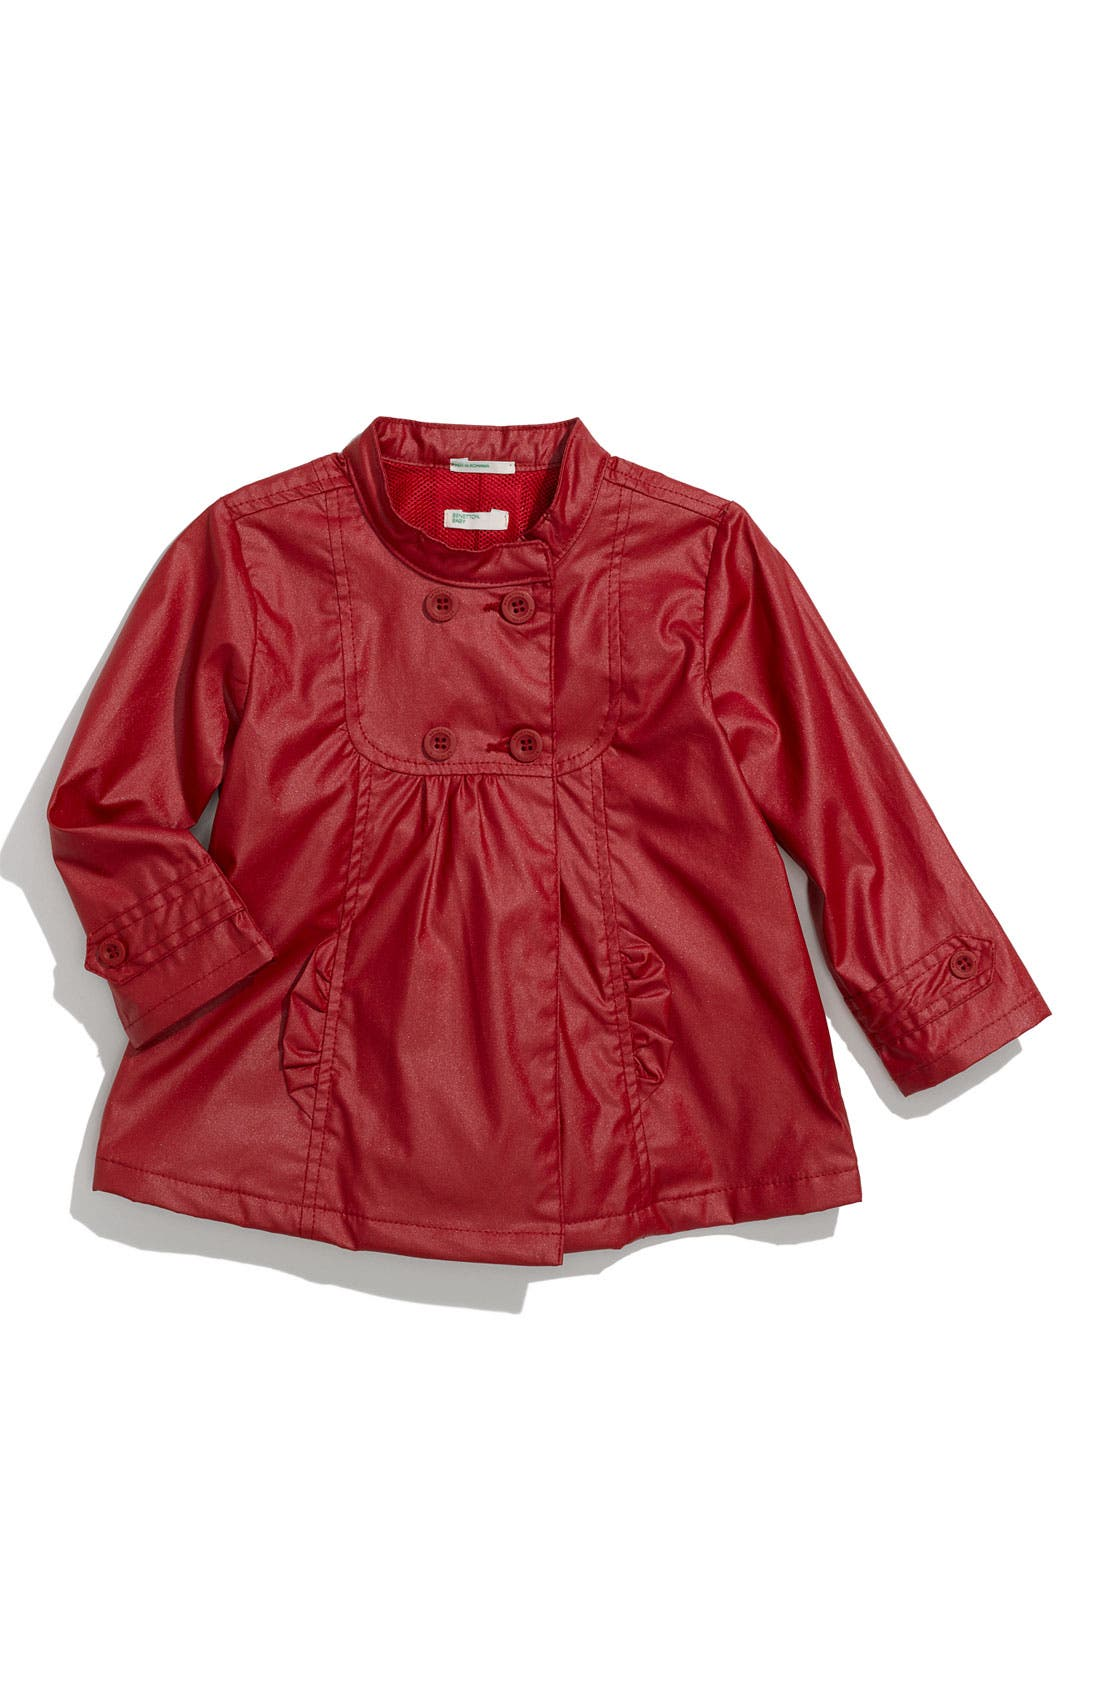 Alternate Image 1 Selected - United Colors of Benetton Kids Raincoat (Infant)